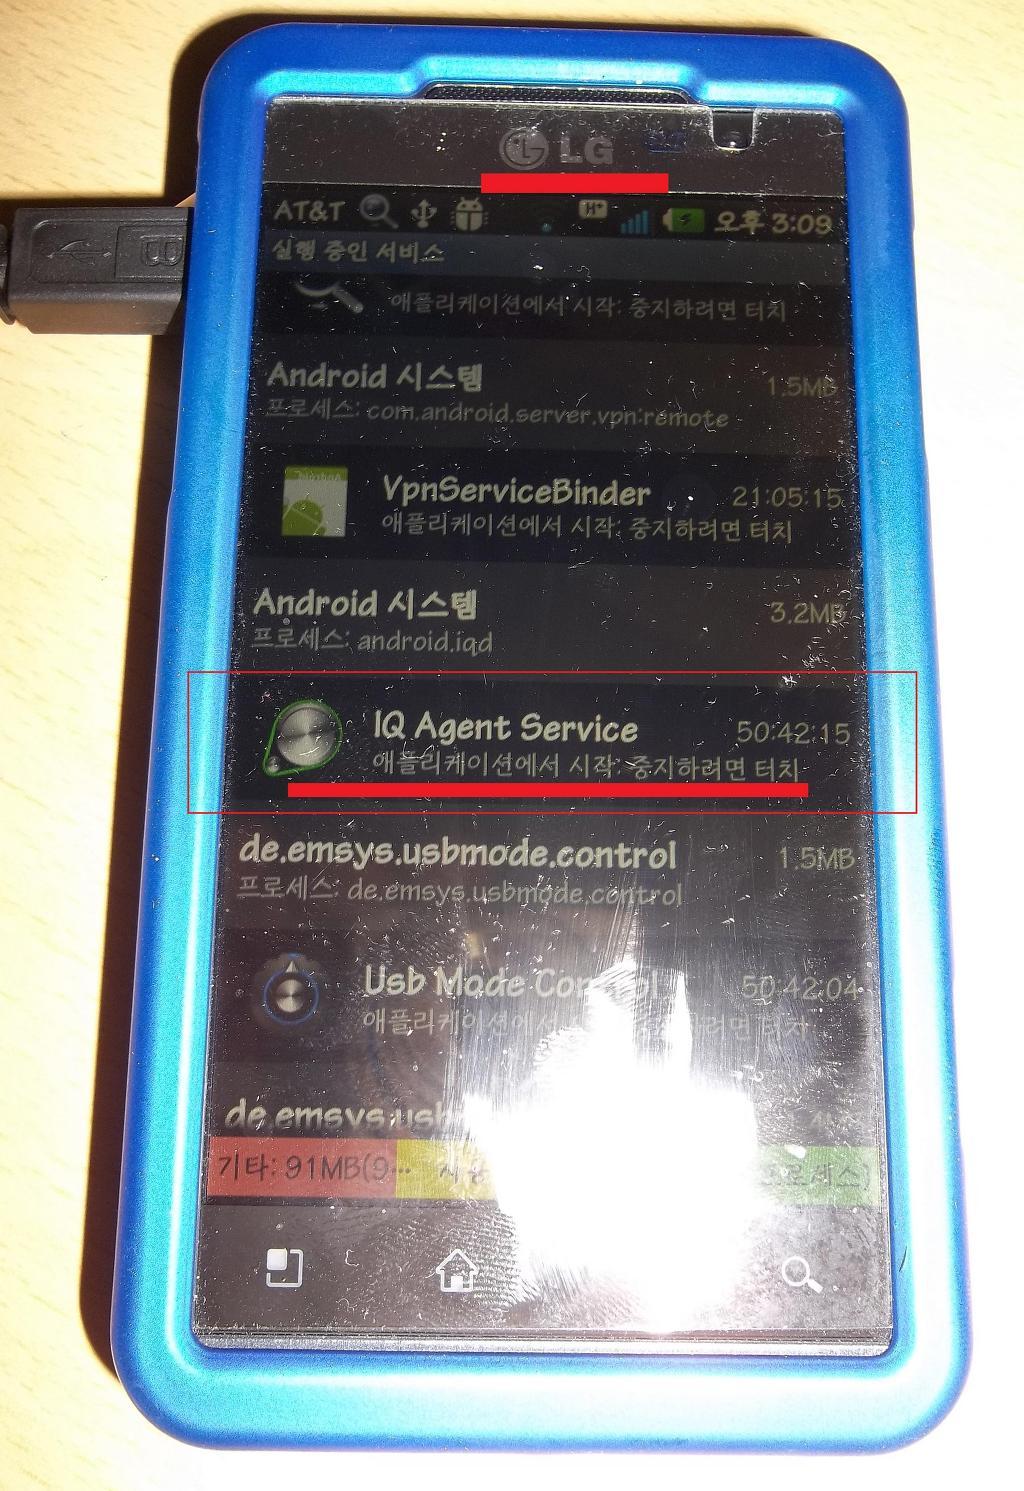 LG도 캐리어IQ장착, LG 스마트폰도 스파이웨어 장착